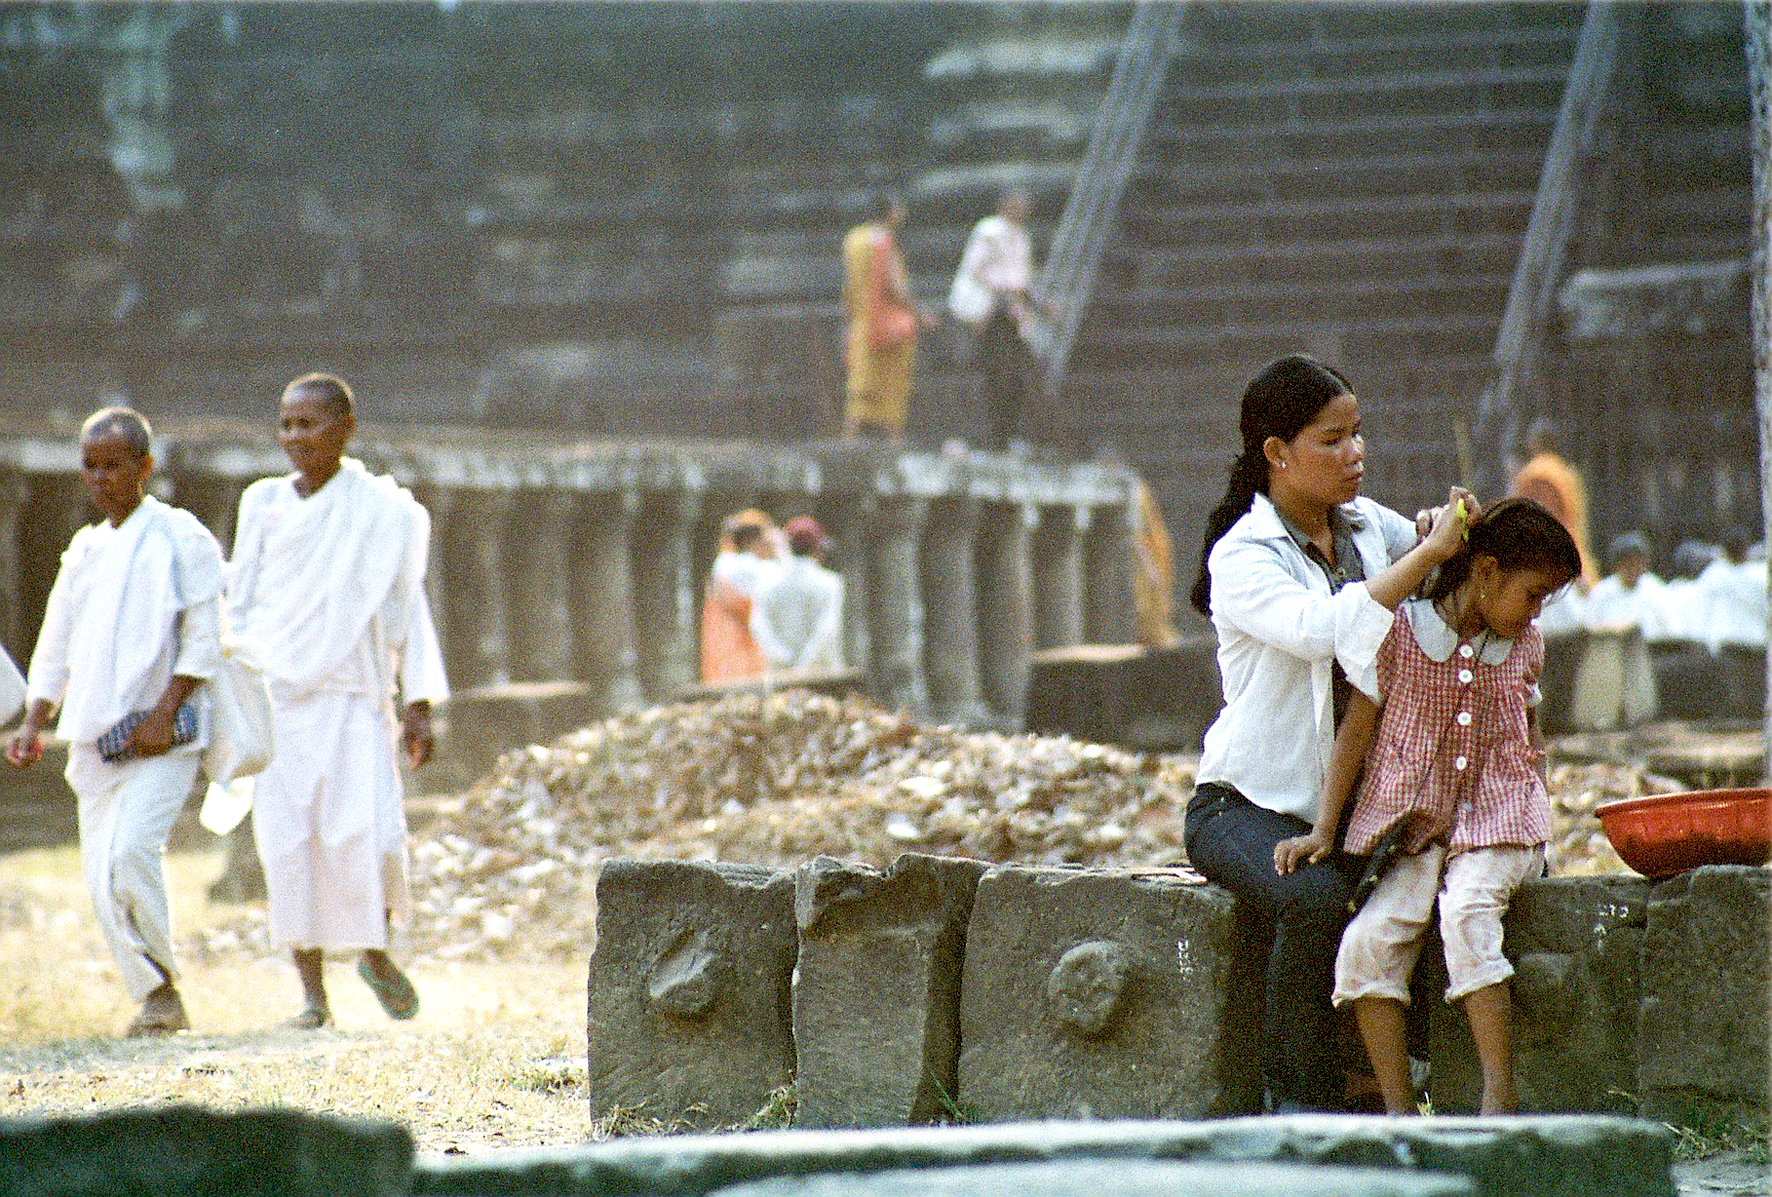 Cambodge 2006